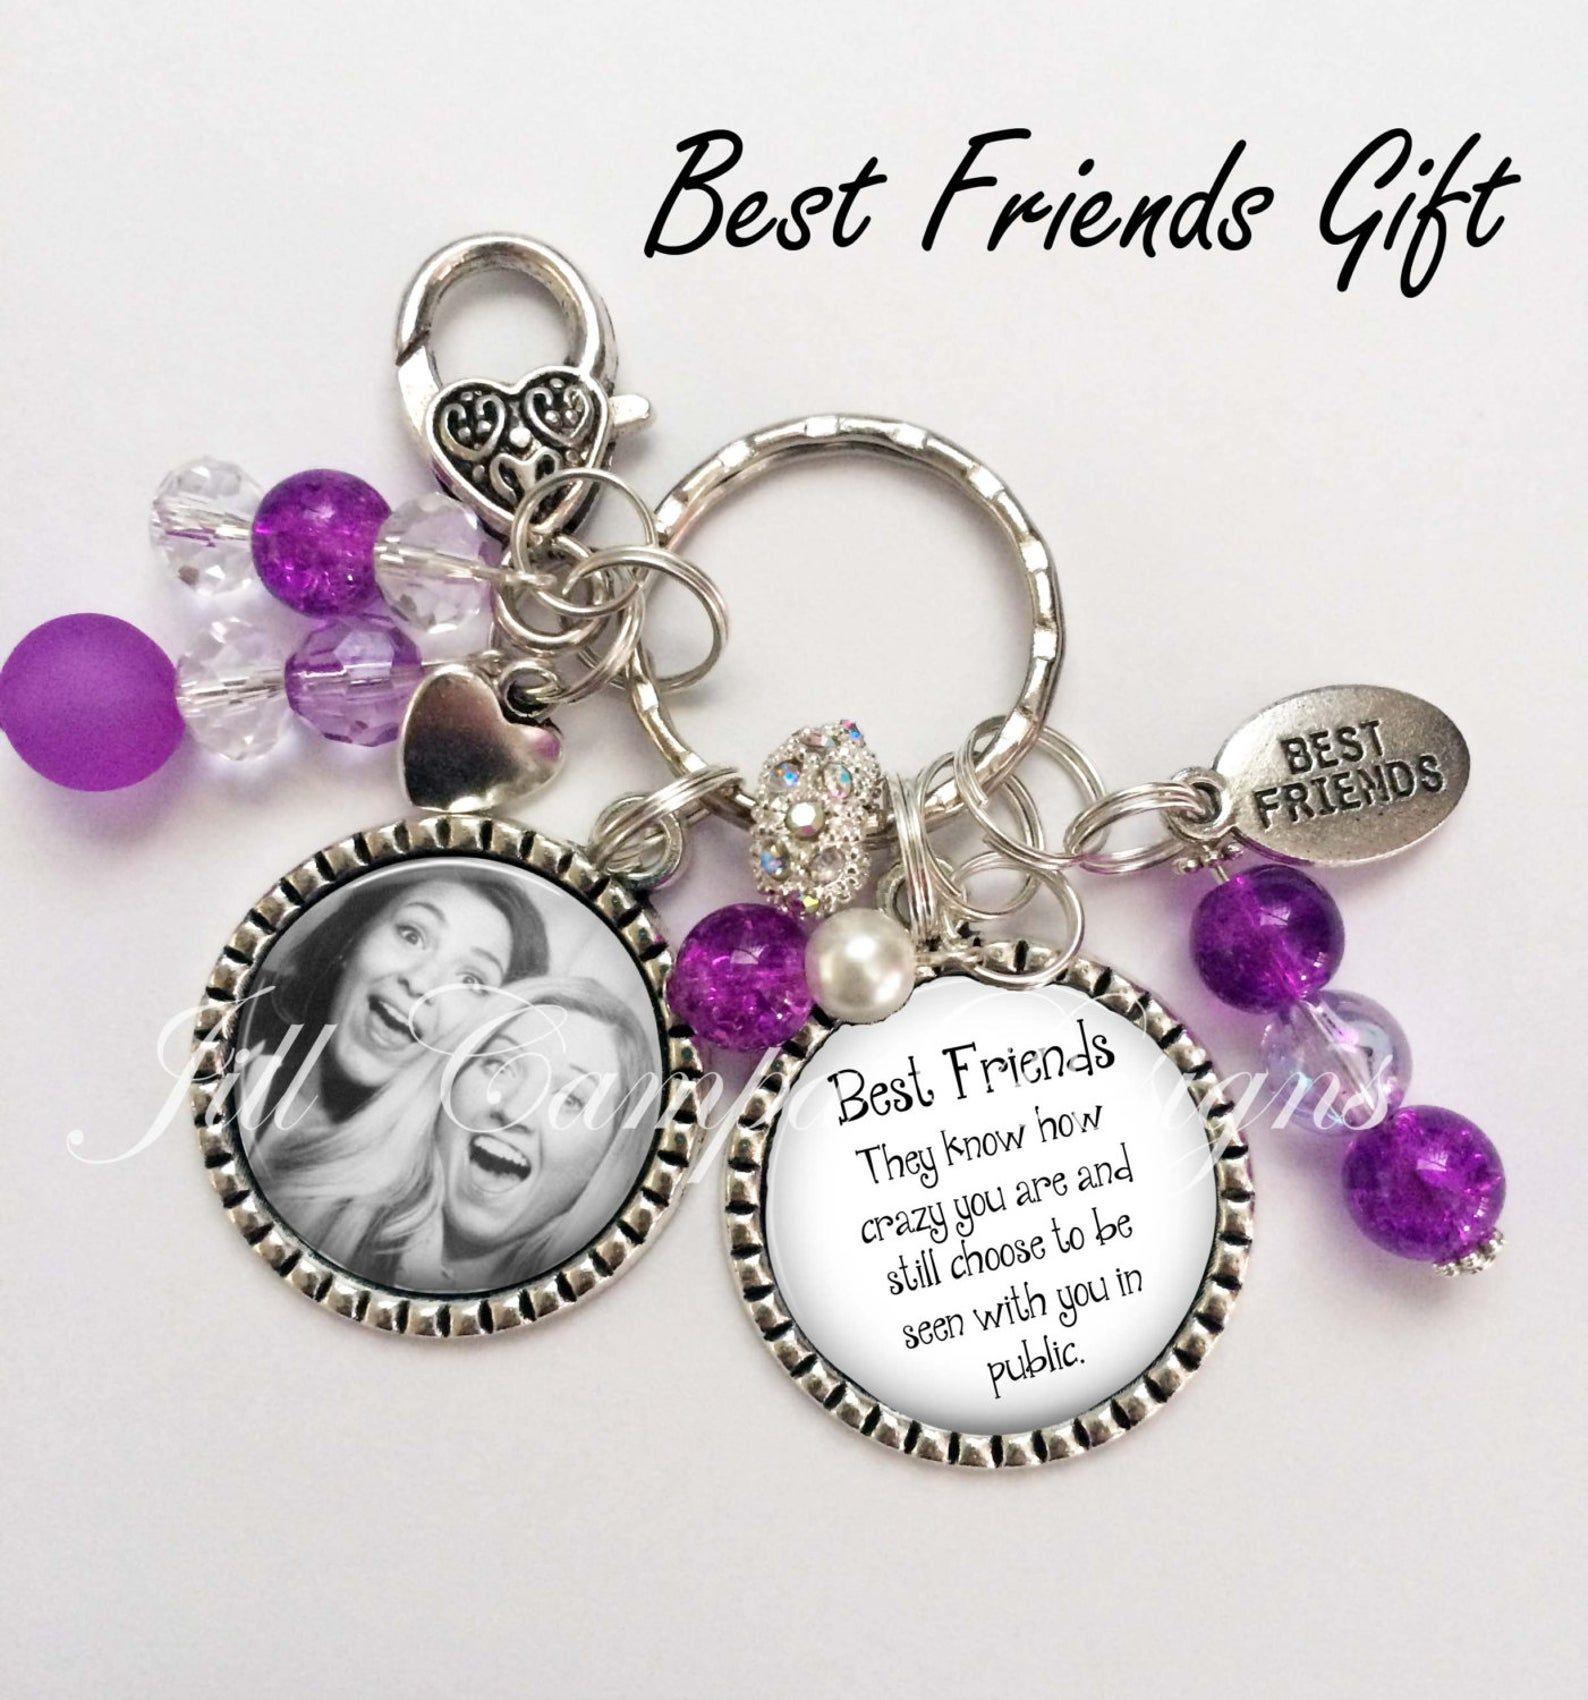 Best friends keychain best friends they know how crazy